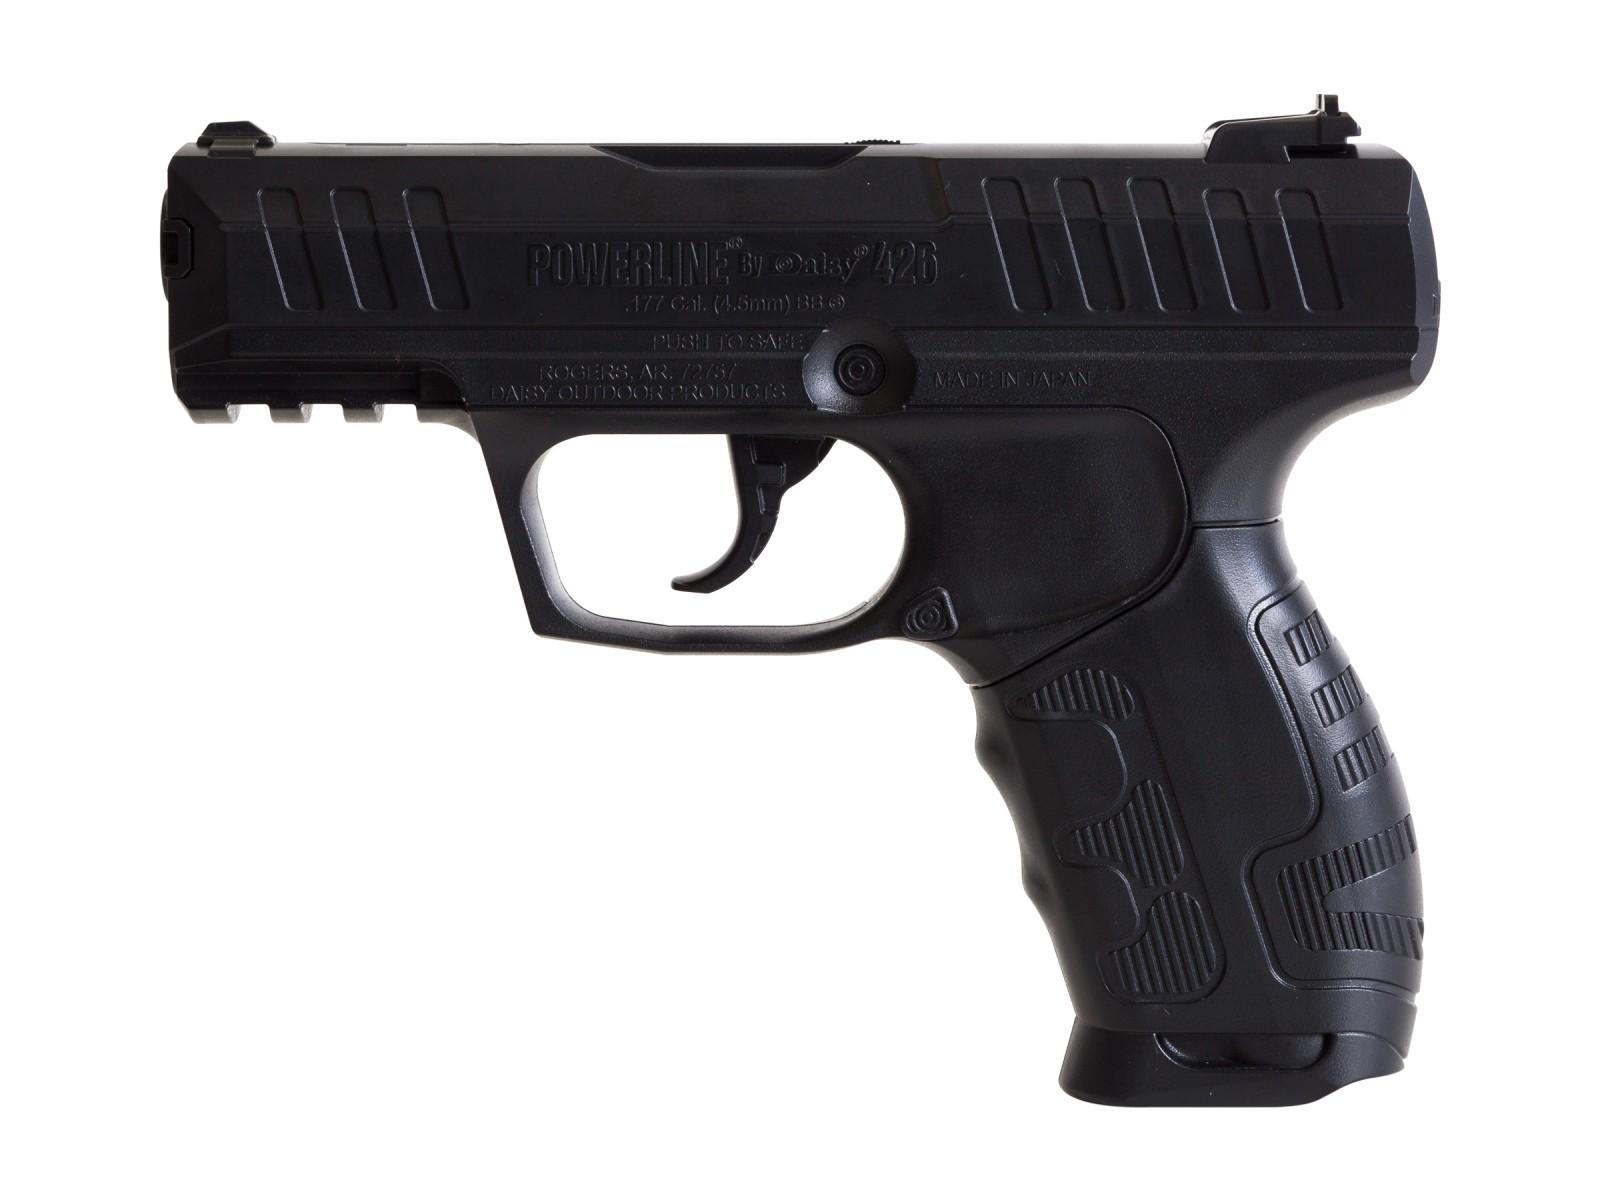 Cheap Daisy 426 CO2 BB Pistol 0.177